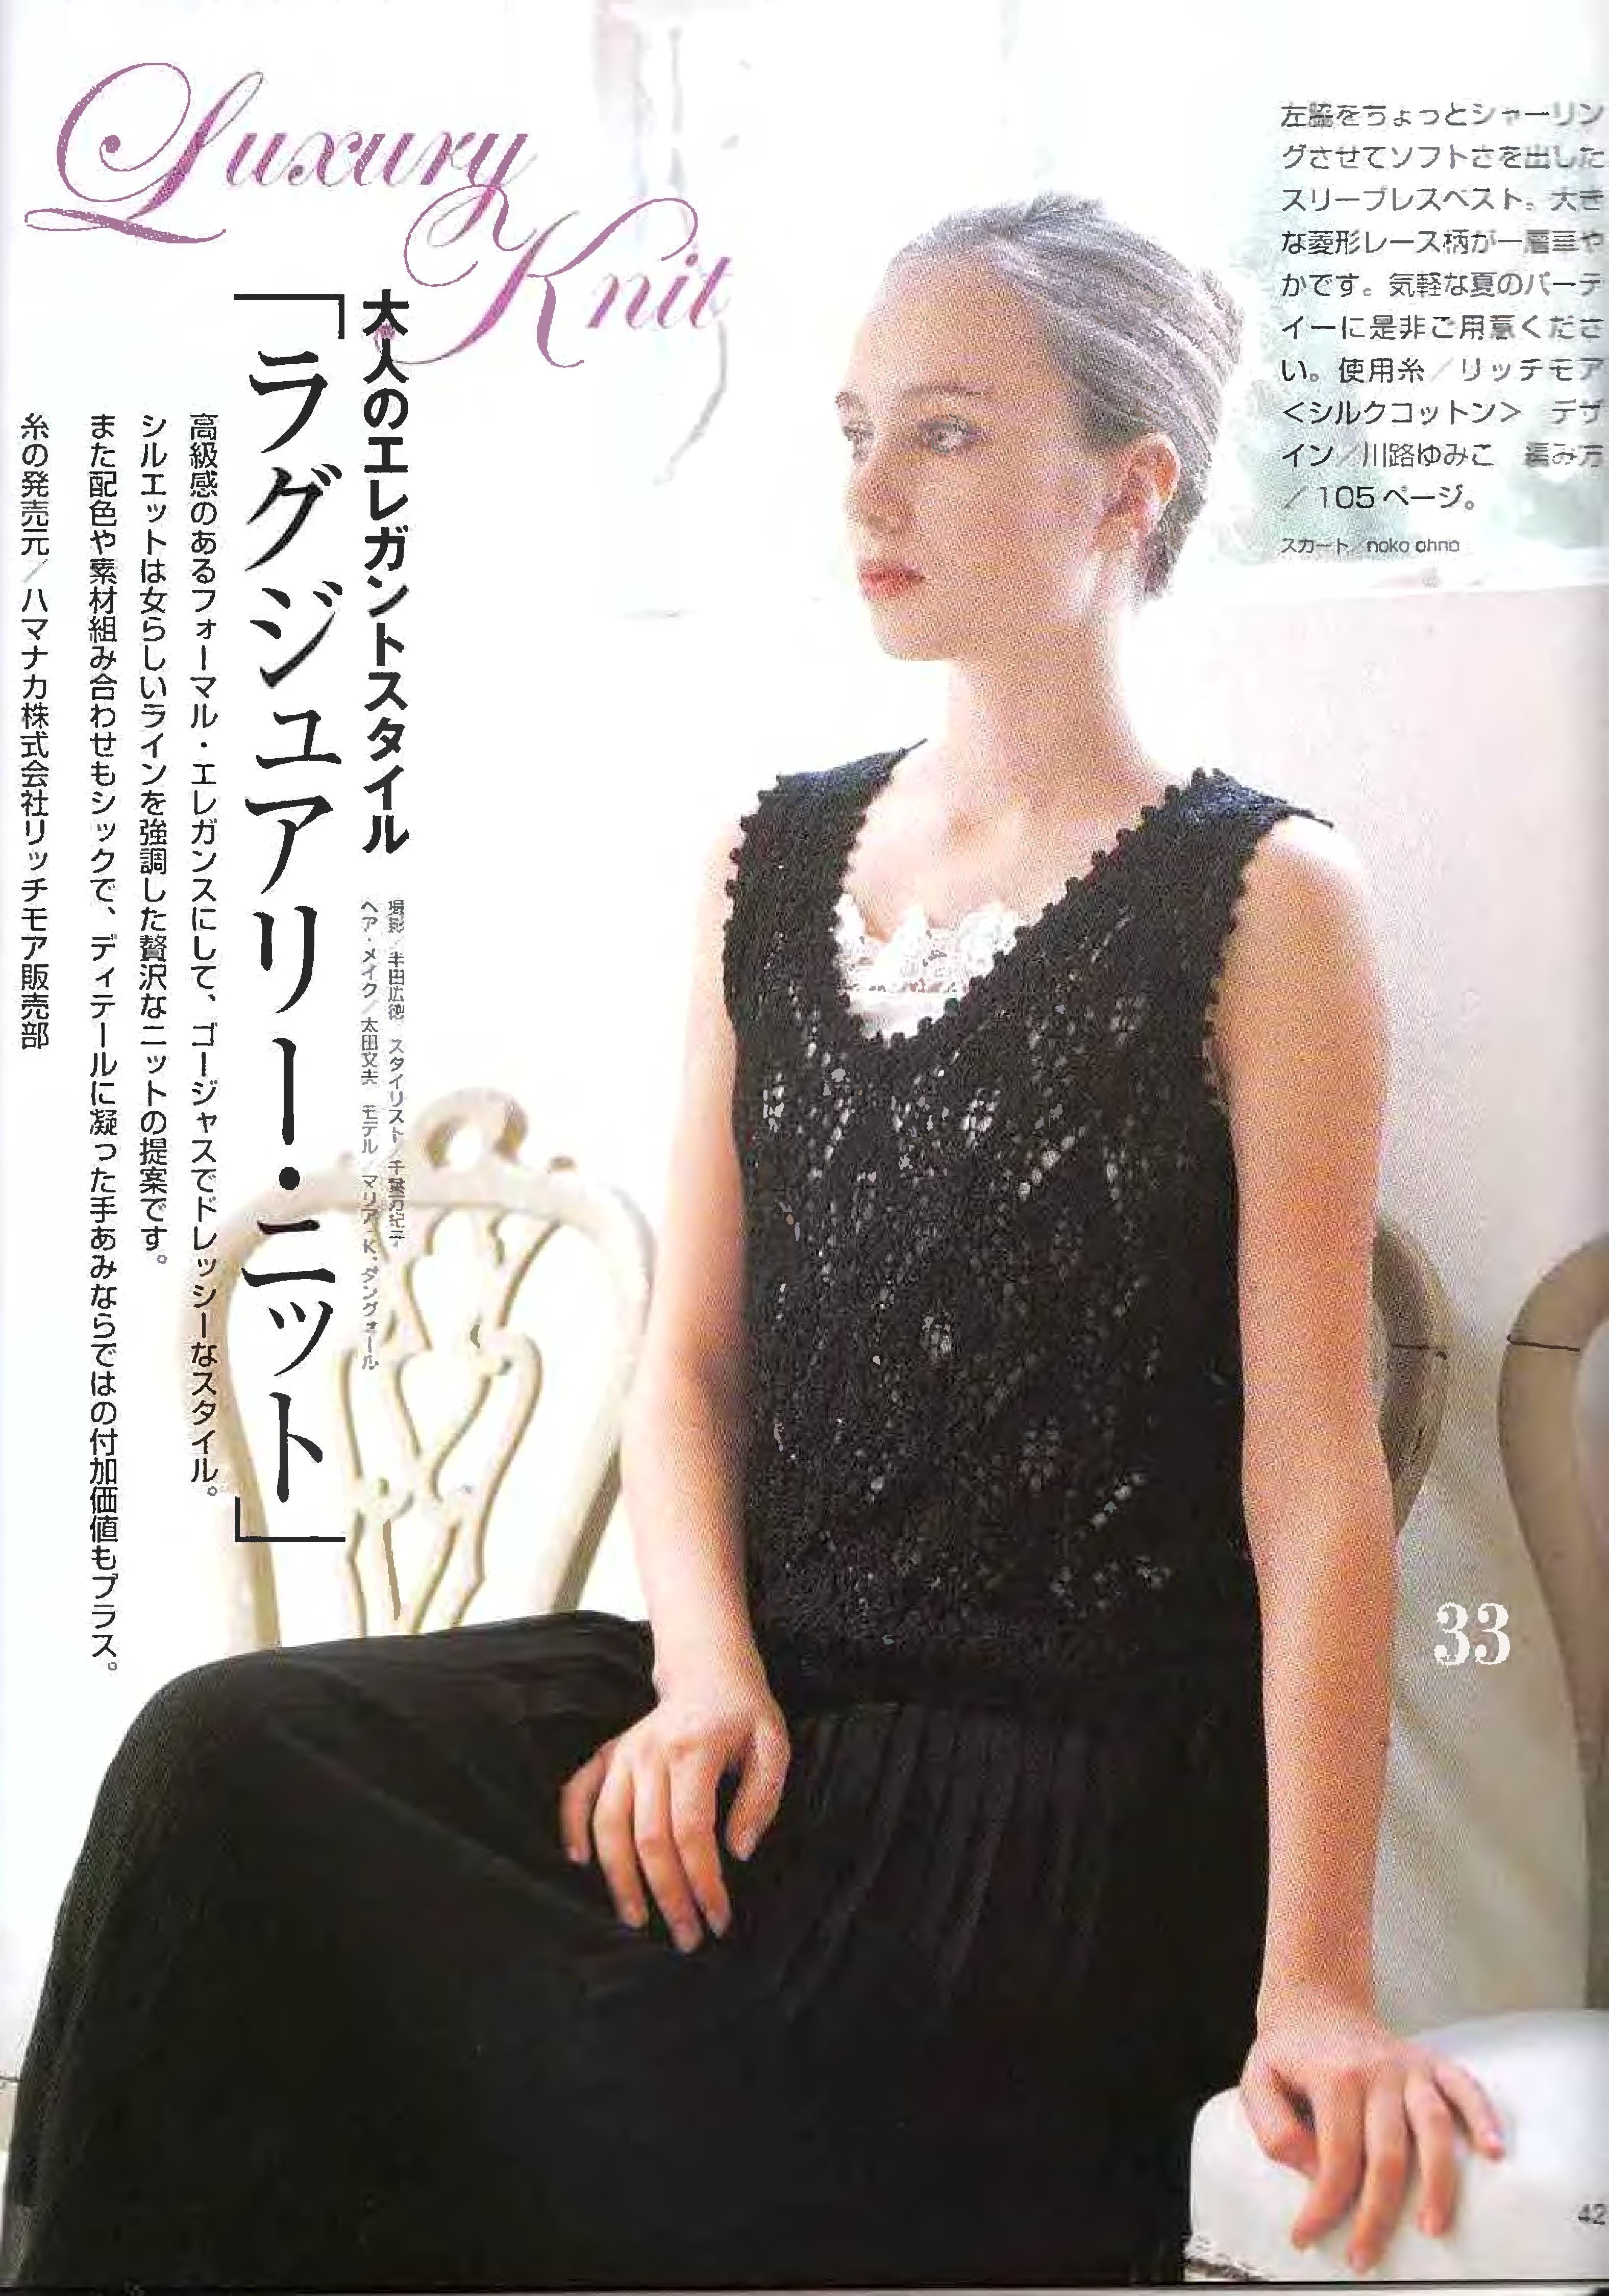 Lets-knit-series-NV4359-2008-Spring-Summer-sp-kr_40.jpg